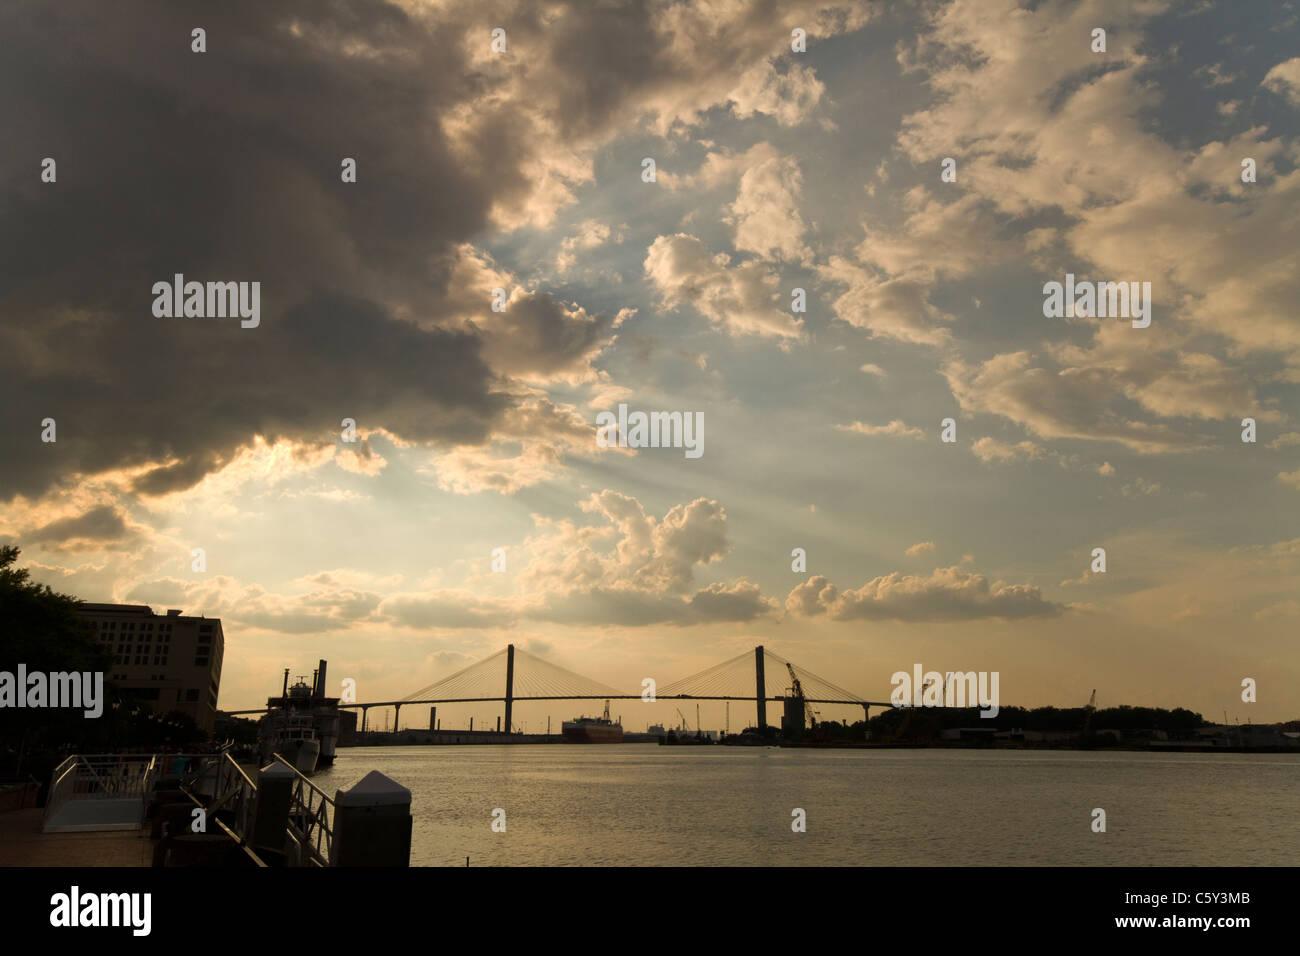 Sunset in Savannah GA - Stock Image